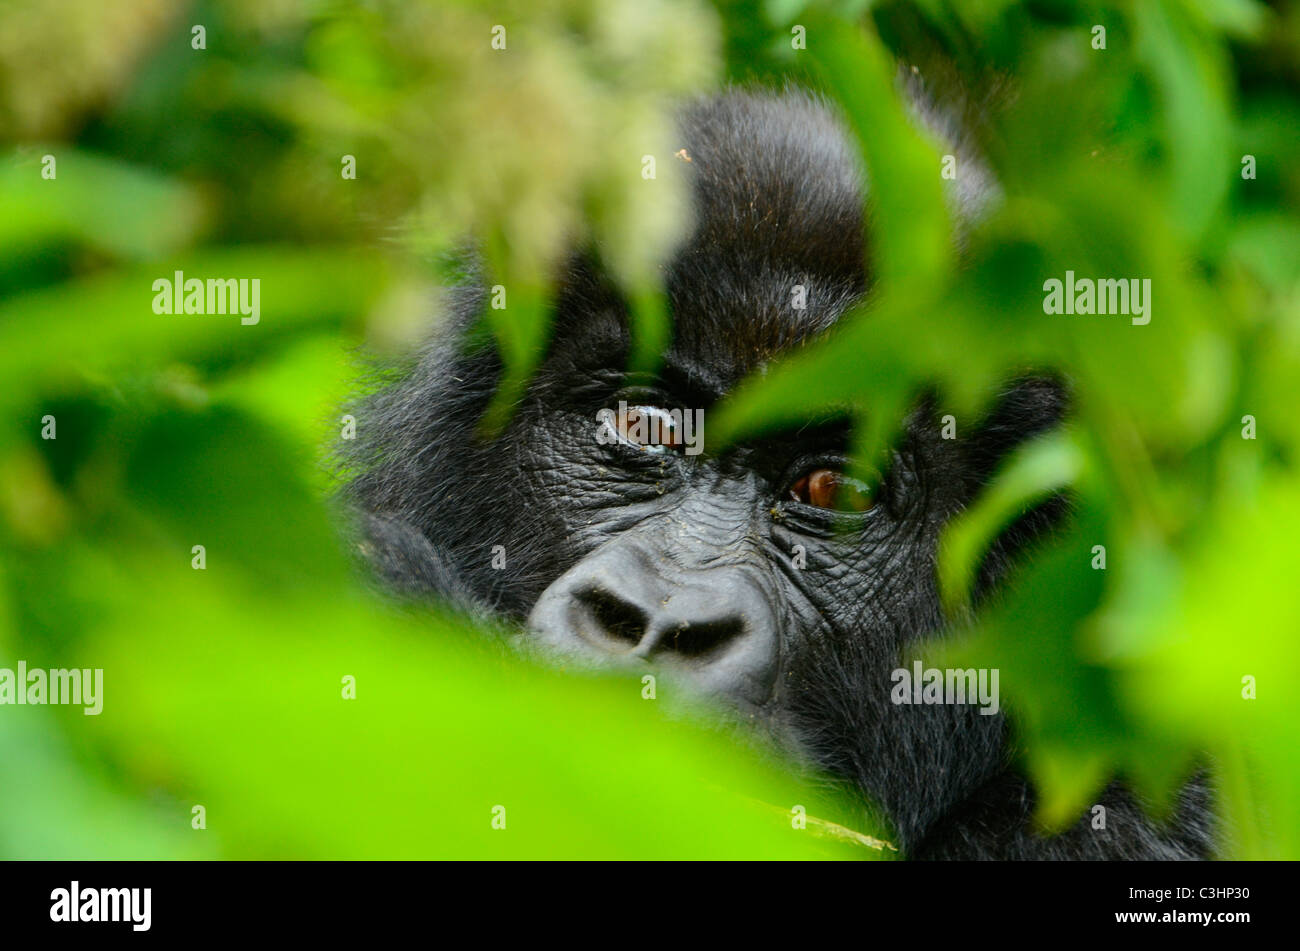 Gorilla trekking at Buhimo in the Virunga National park, Democratic Republic of Congo. Young gorilla staring through - Stock Image